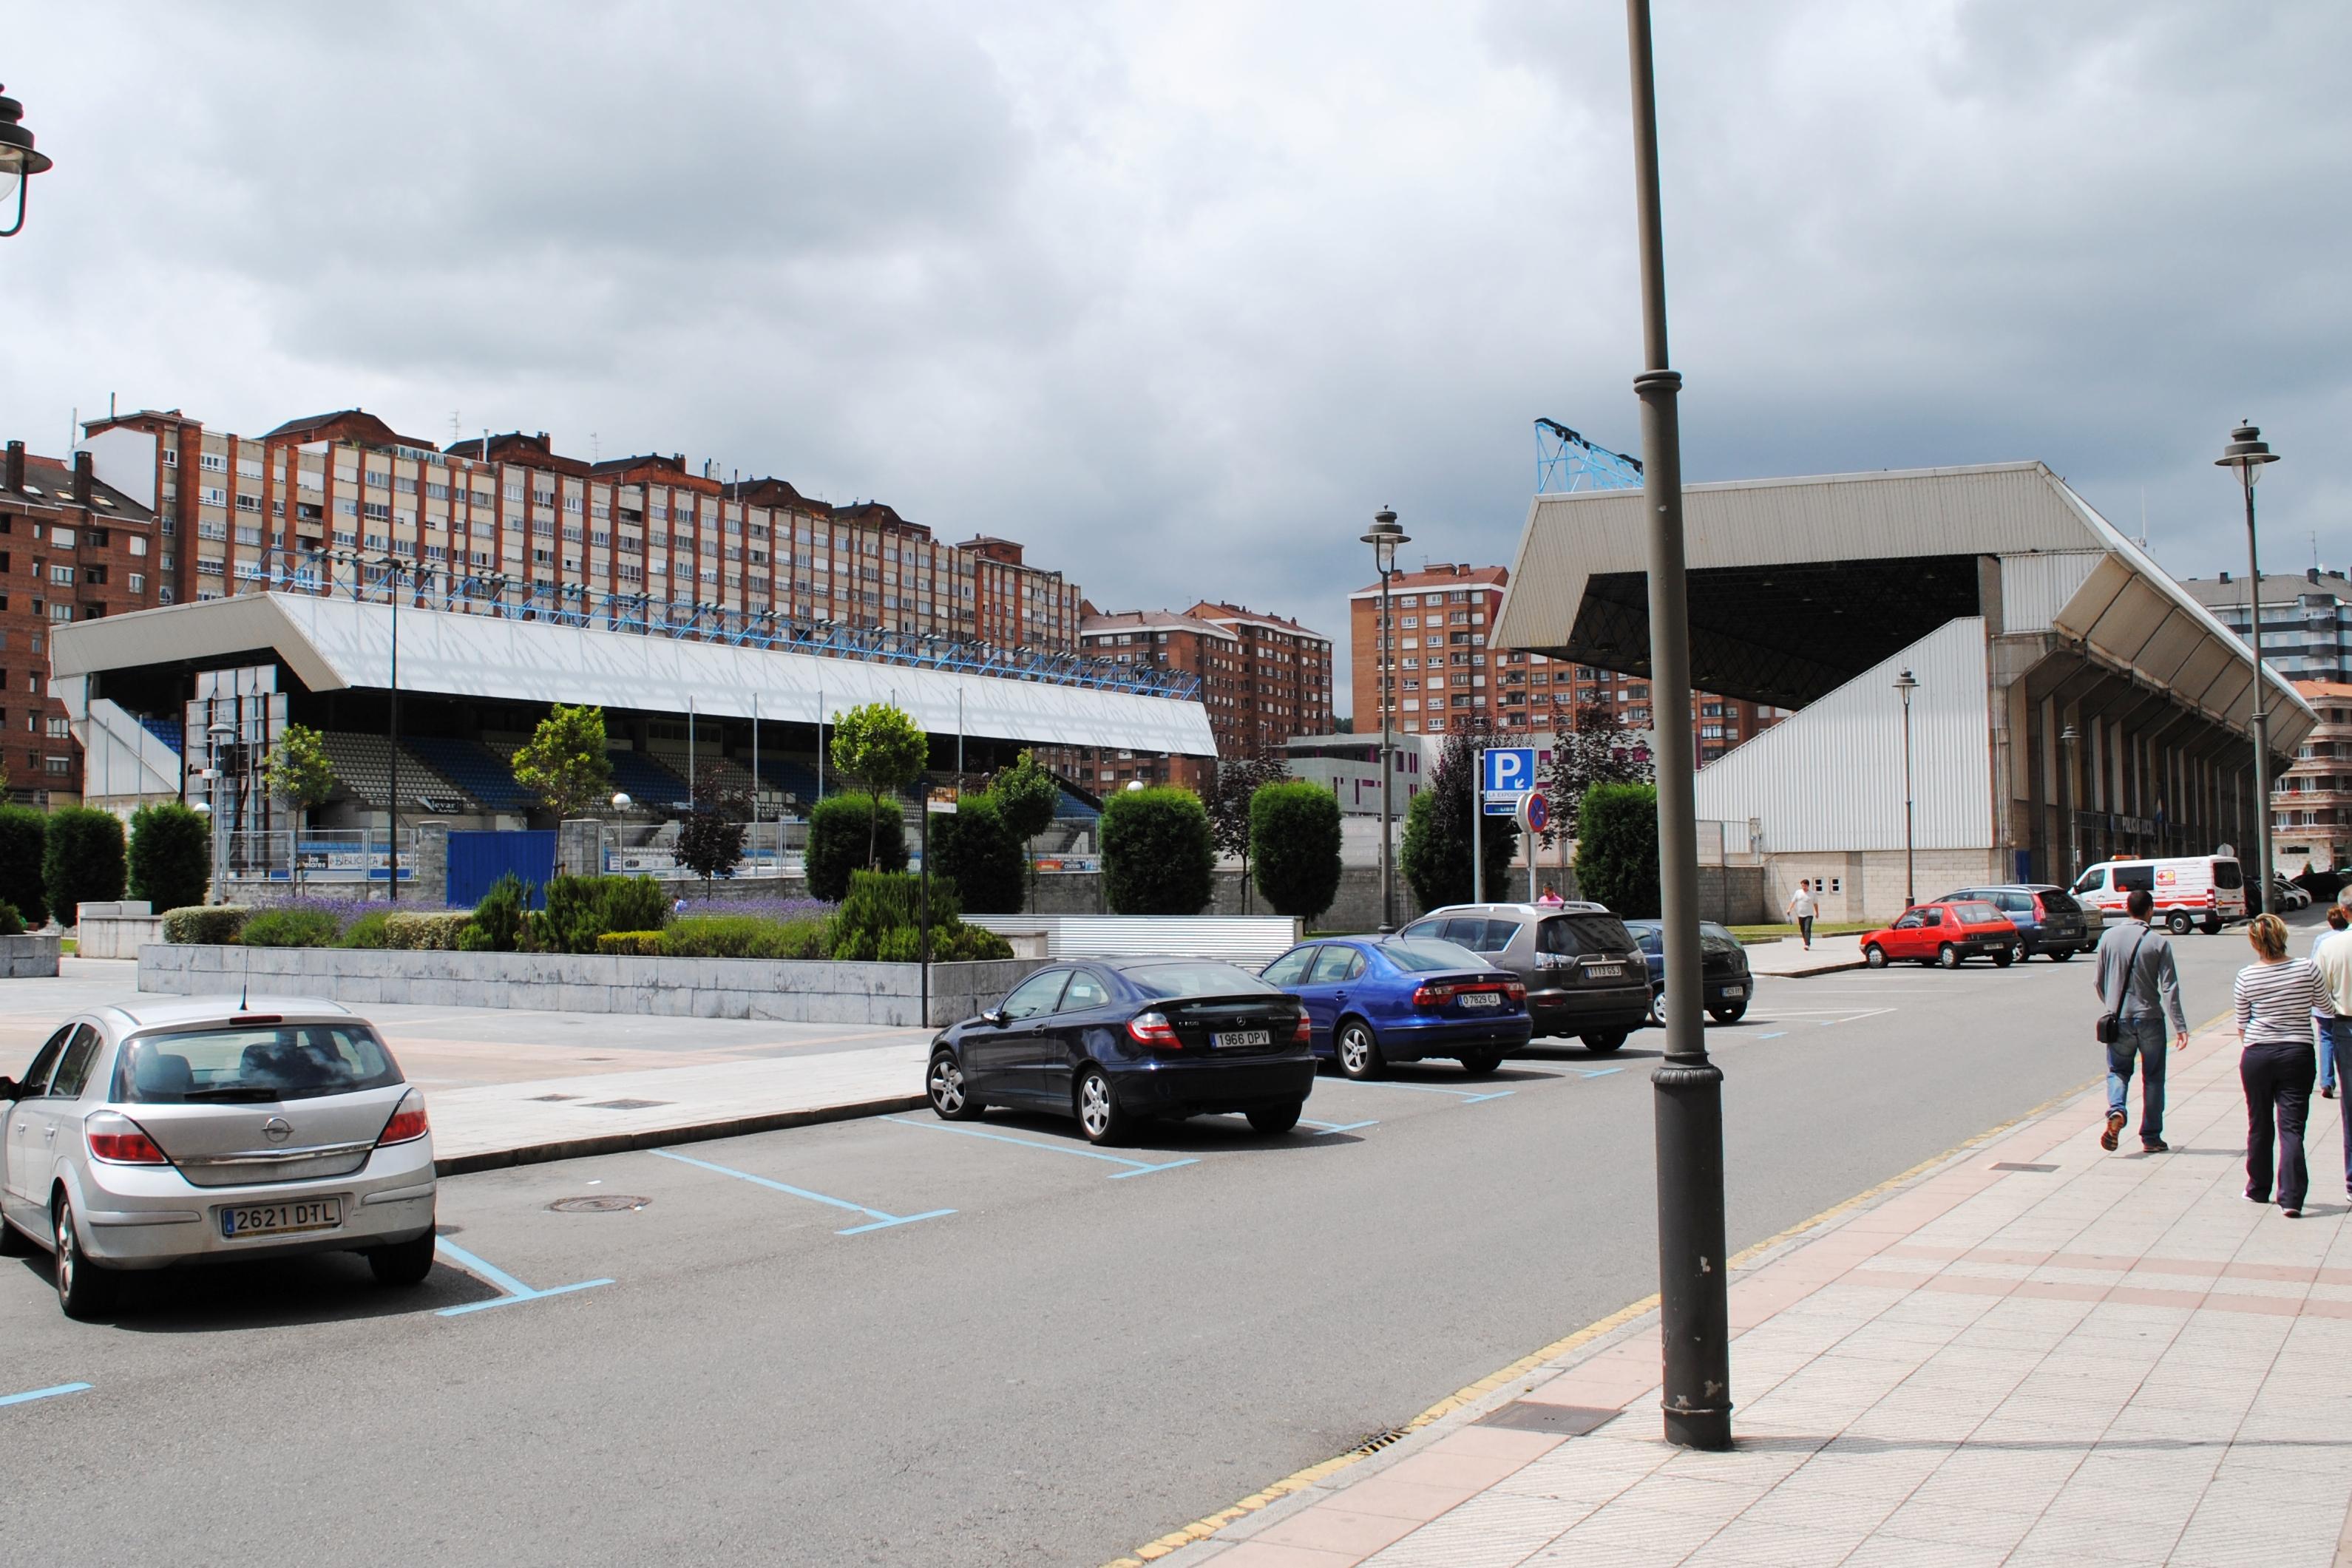 Archivo avil s estadio rom n su rez puerta jpg for Puerta 9 estadio universitario